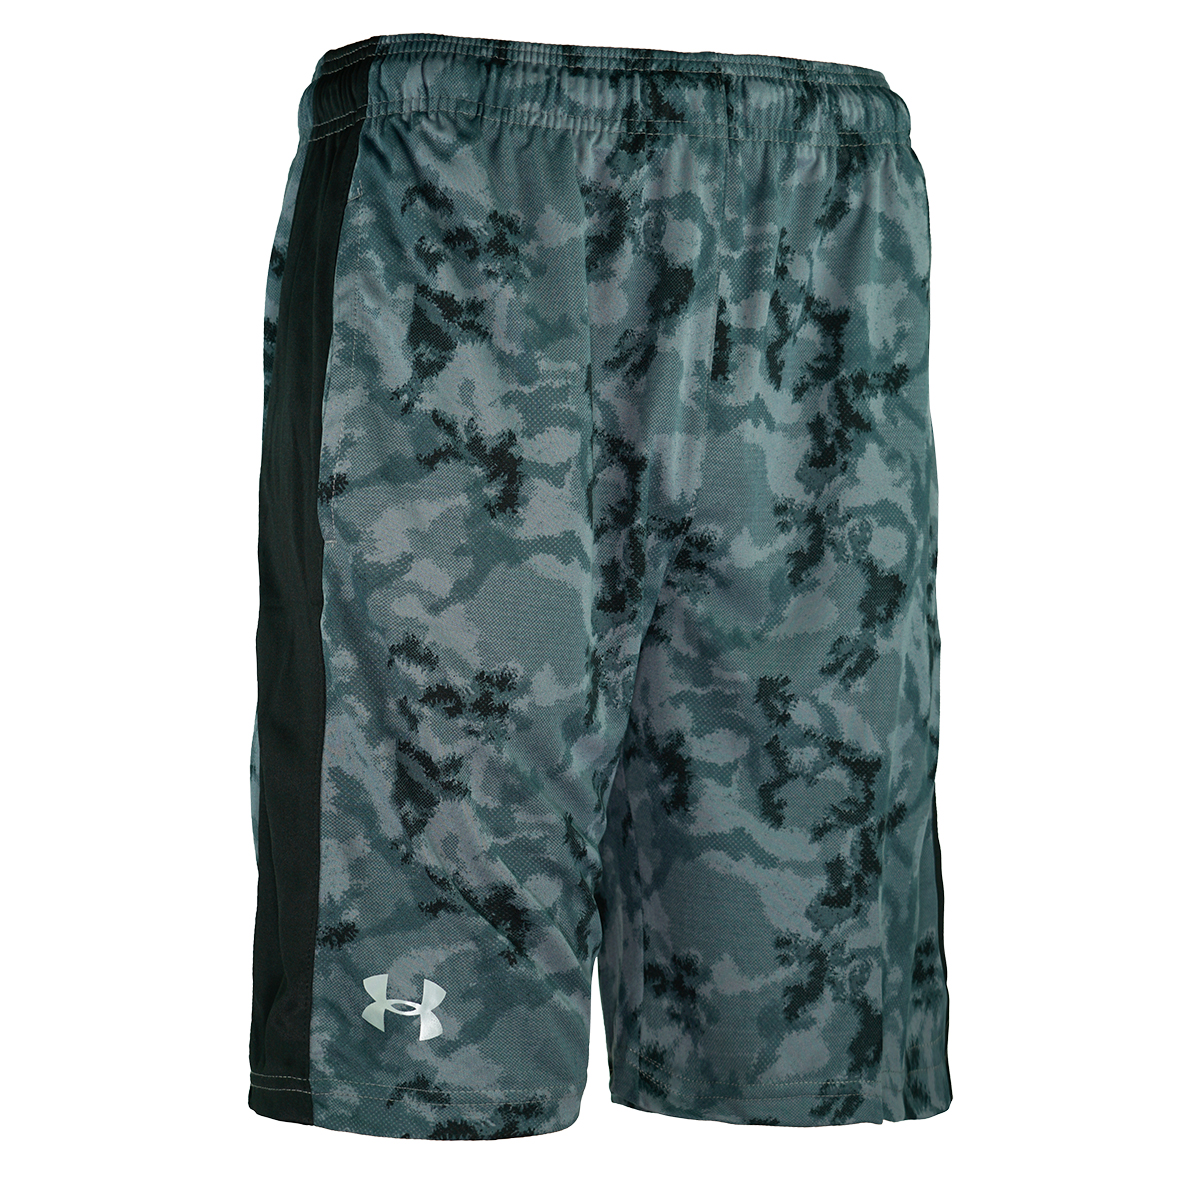 Under Armour Men/'s Woven Graphic Shorts Blue Splatter XL